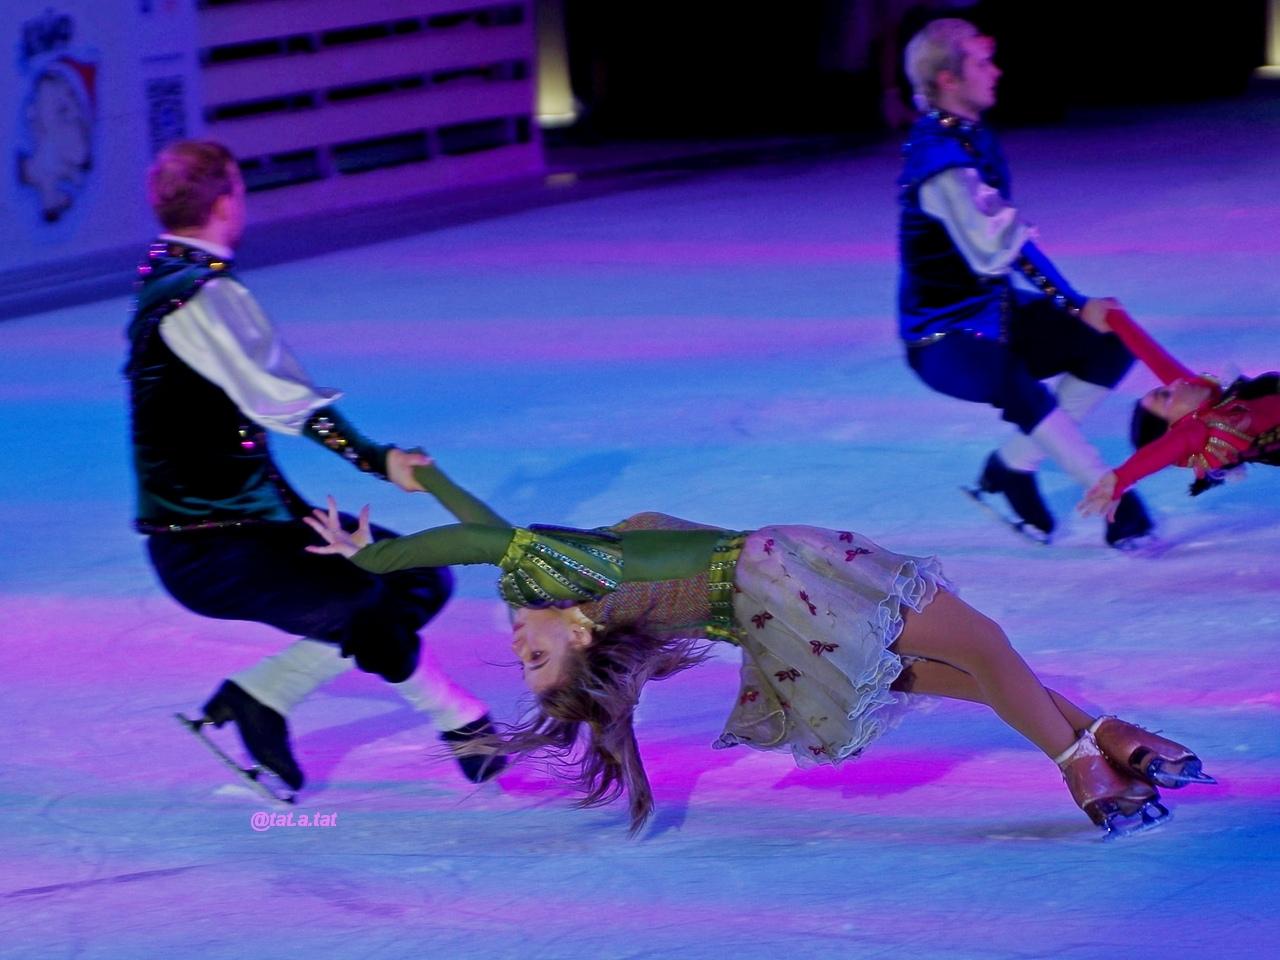 Ледовые шоу-6 - Страница 42 FMgeTVx9ygw